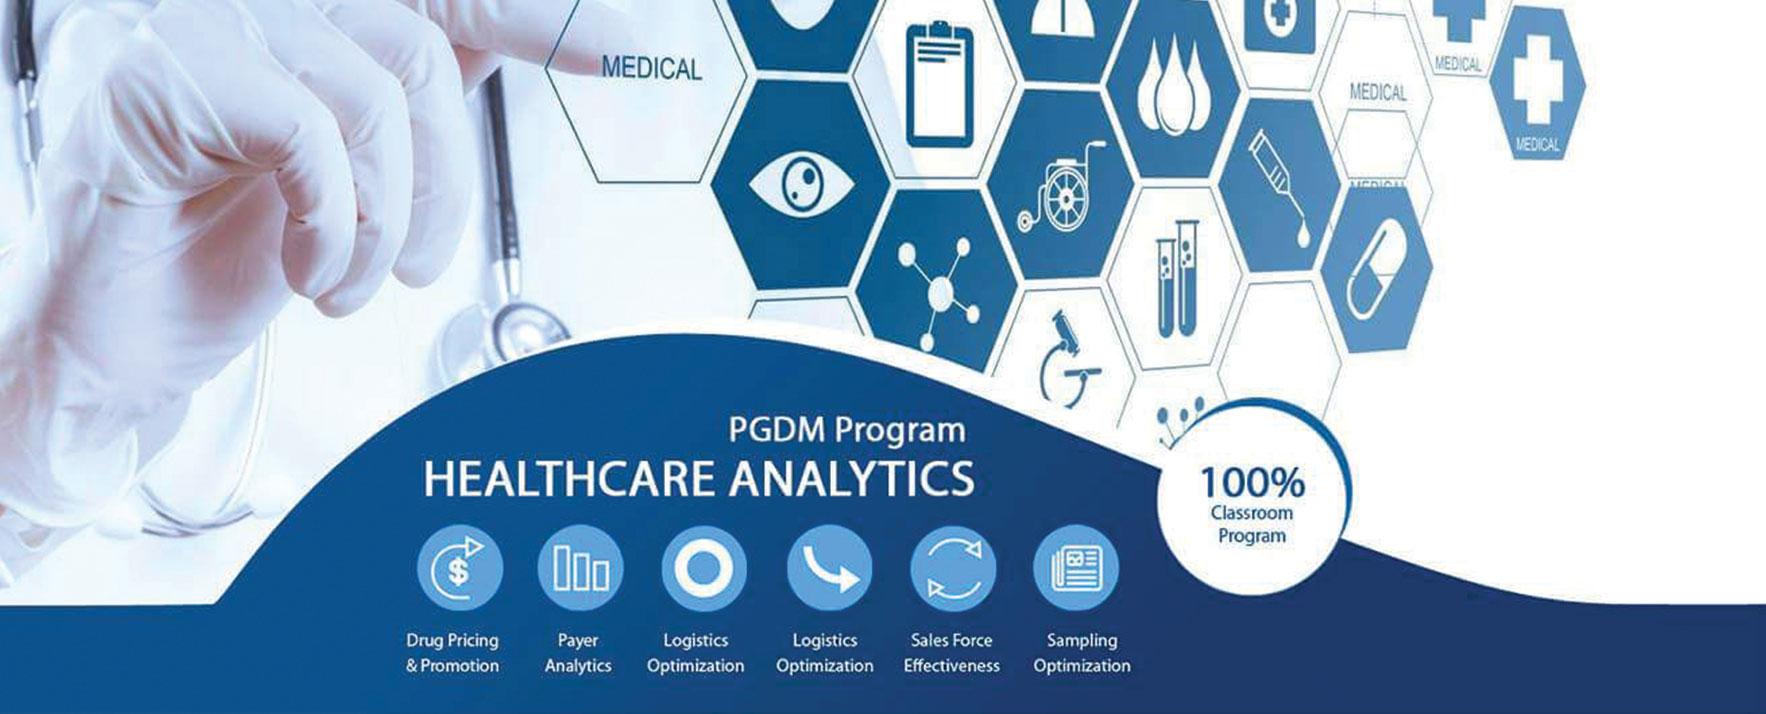 PGDM health care analytics